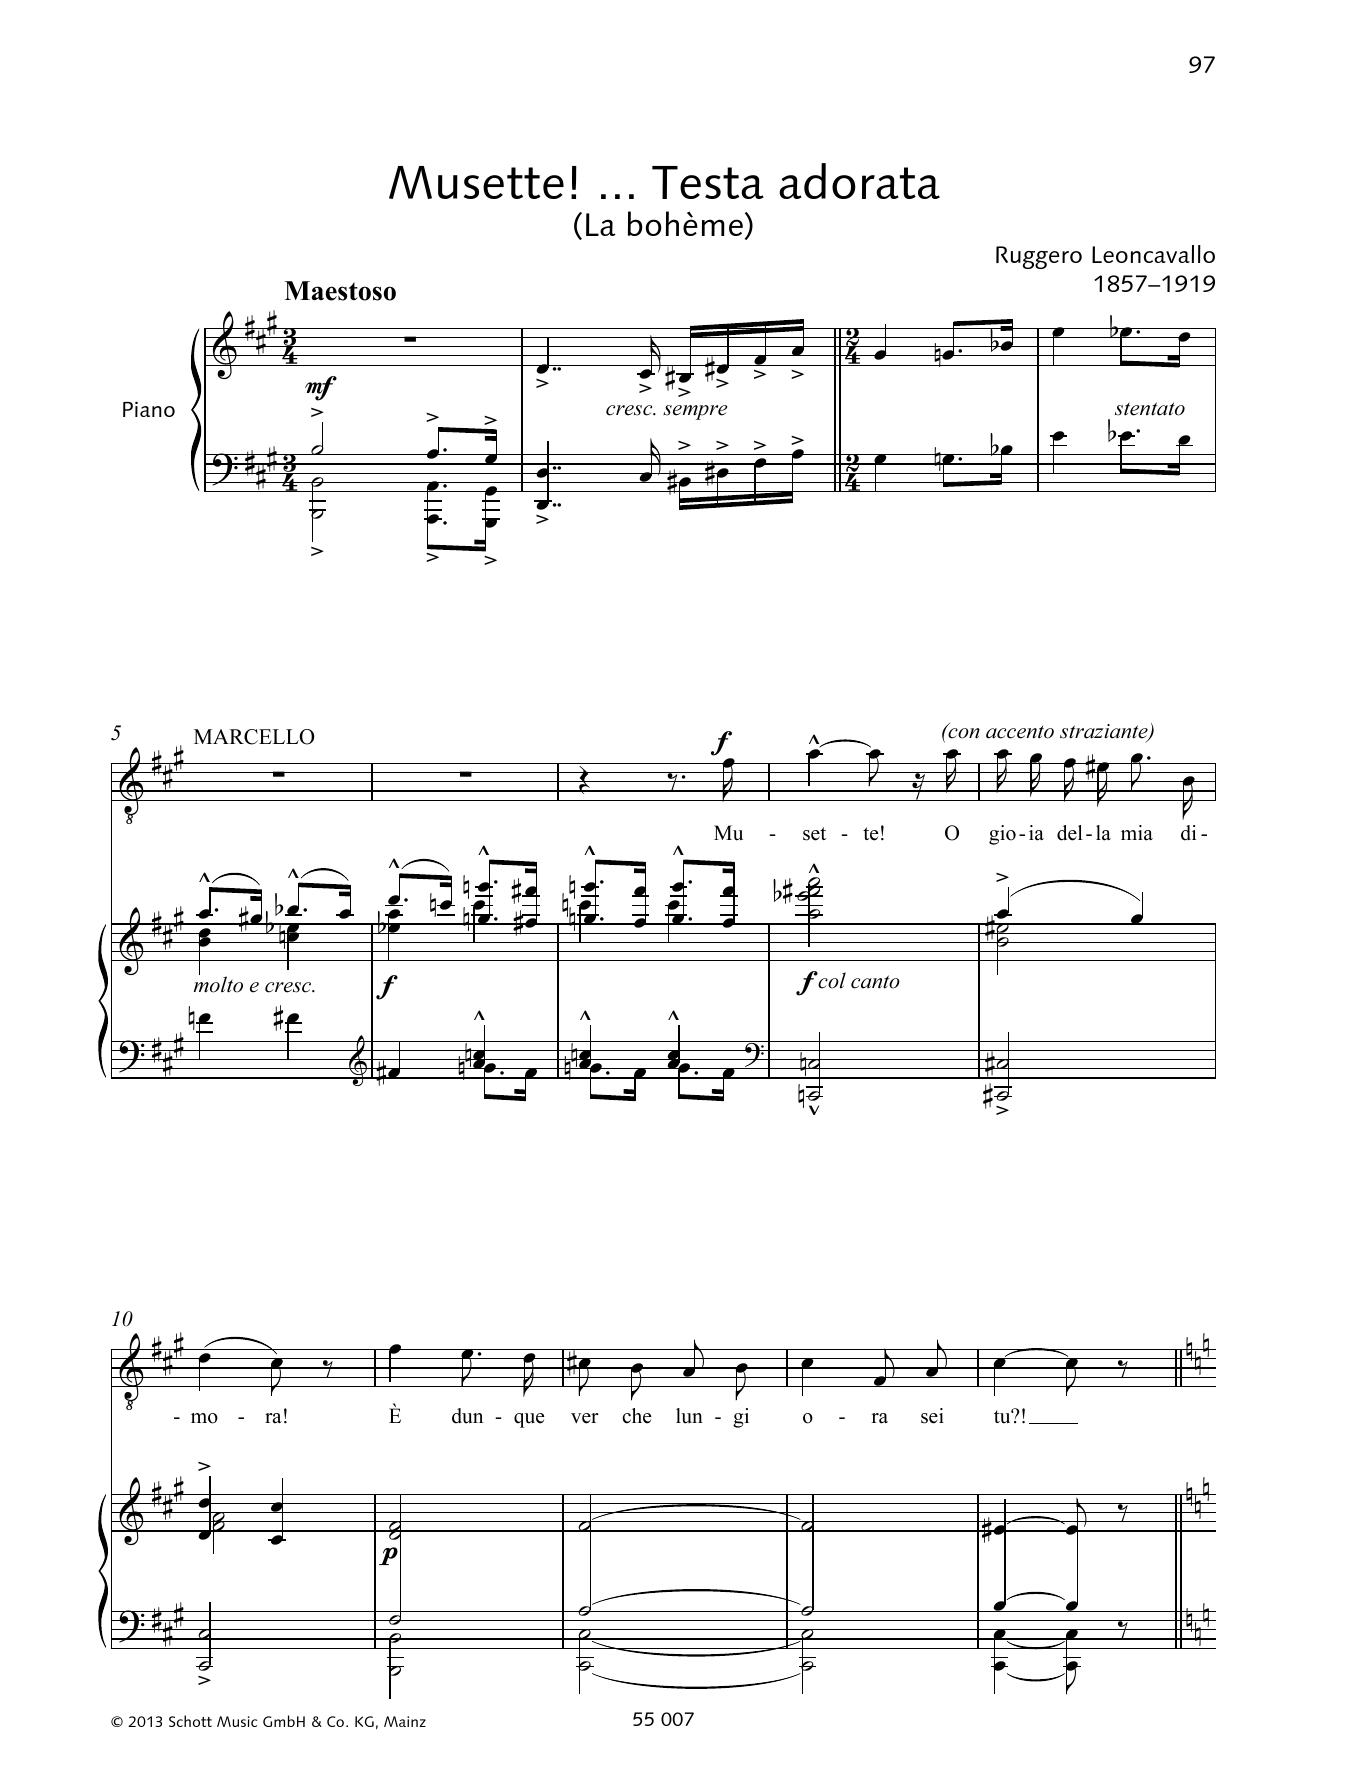 Musette! ... Testa adorata Sheet Music